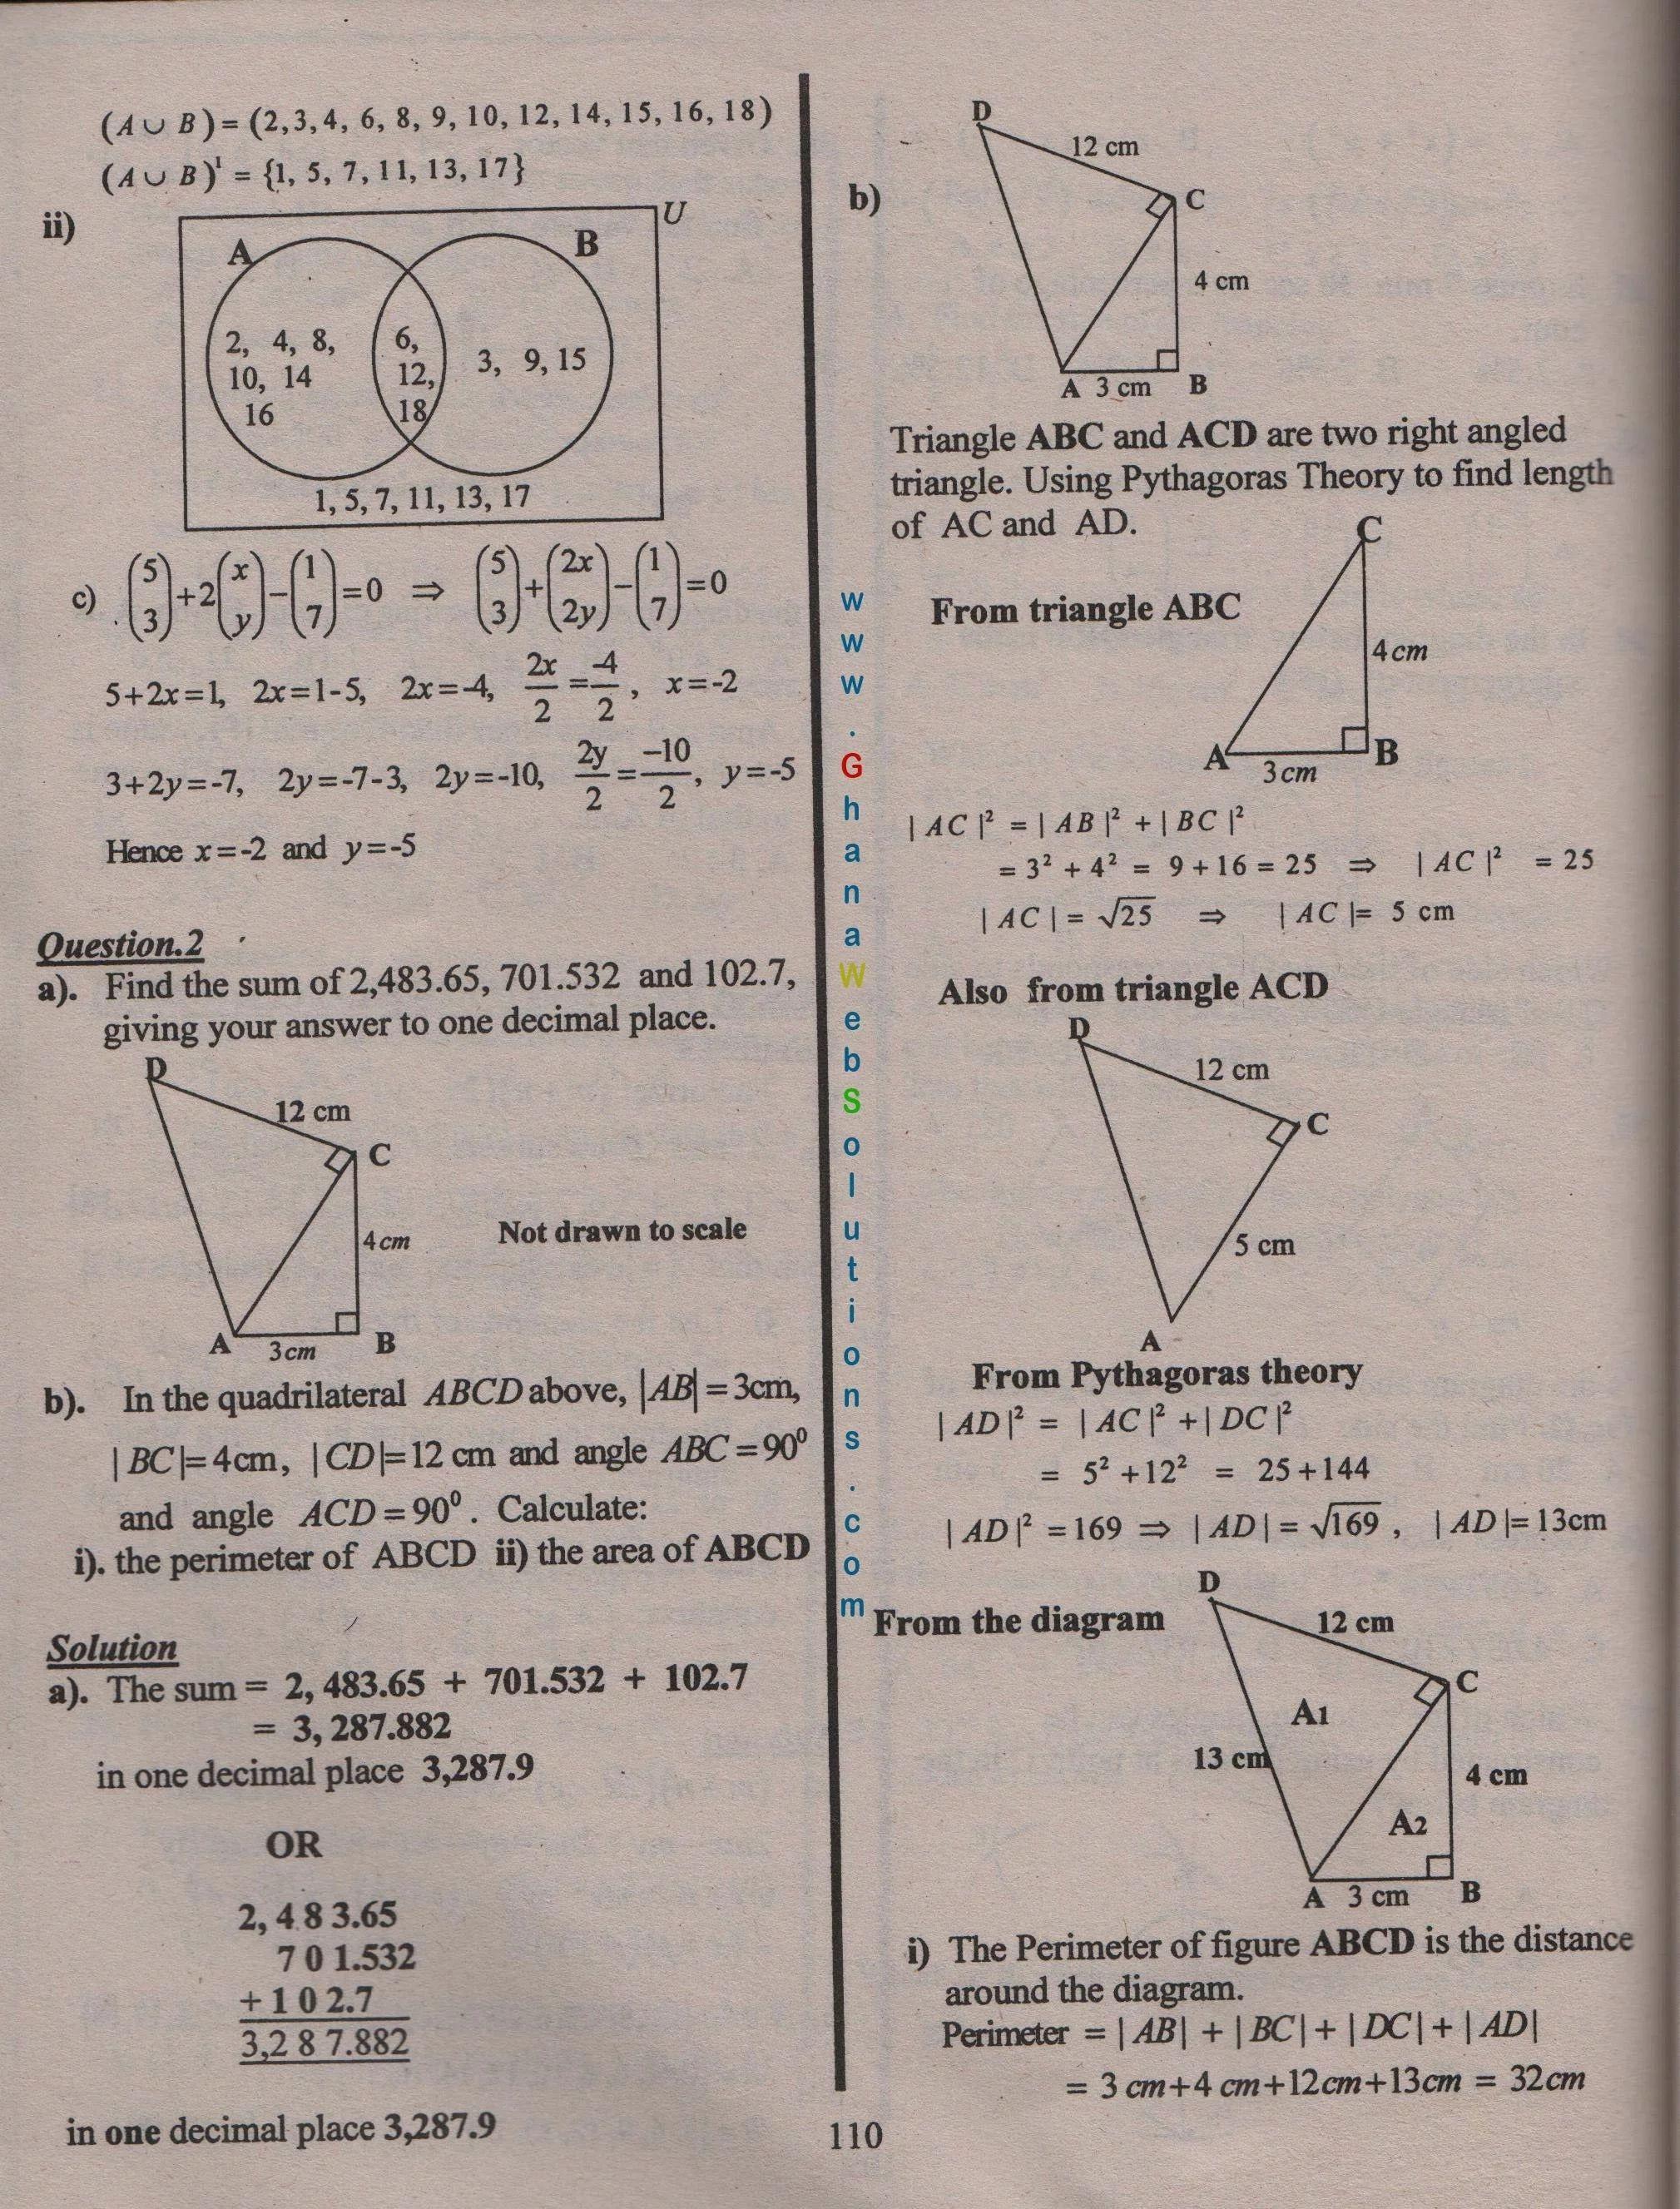 BISE Faisalabad Board Past Papers 2020 Matric, SSC Part 1 ...  |Mathematics Past Paper 2020